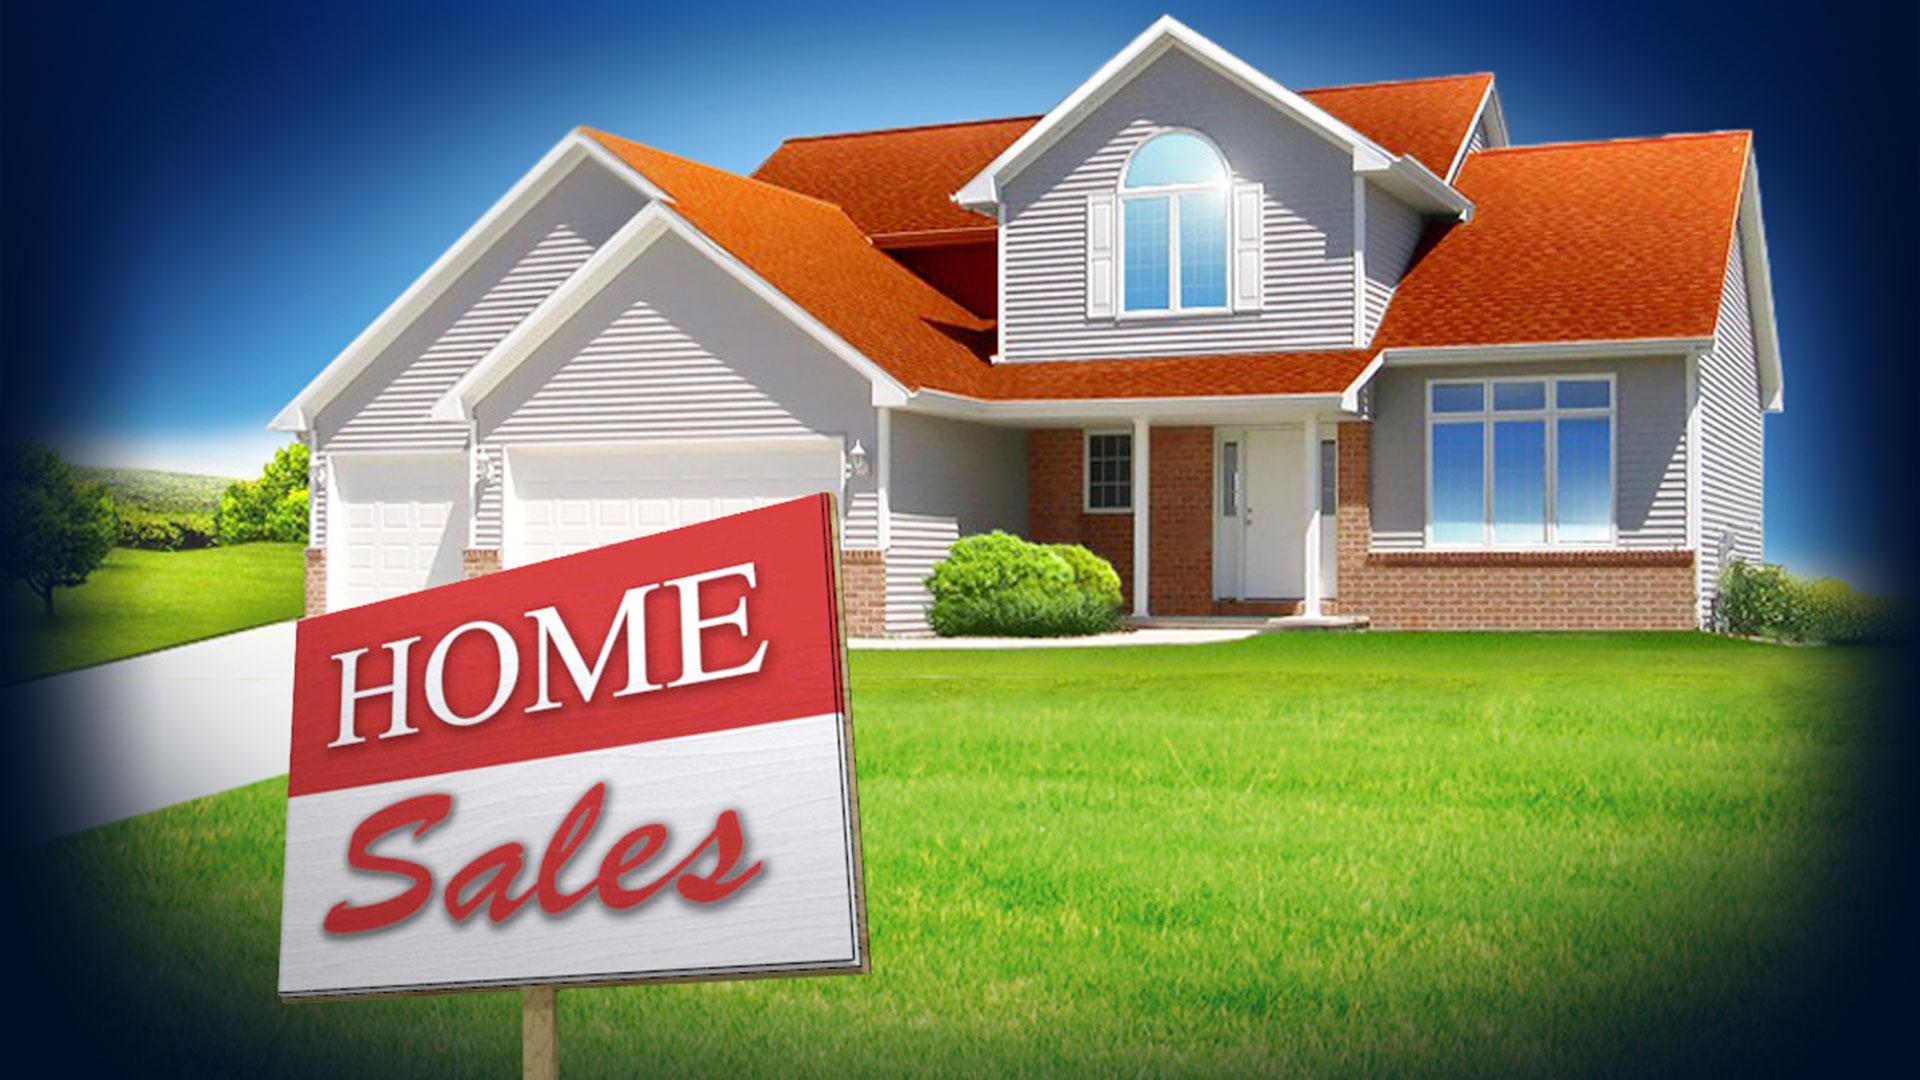 KELO Housing Market